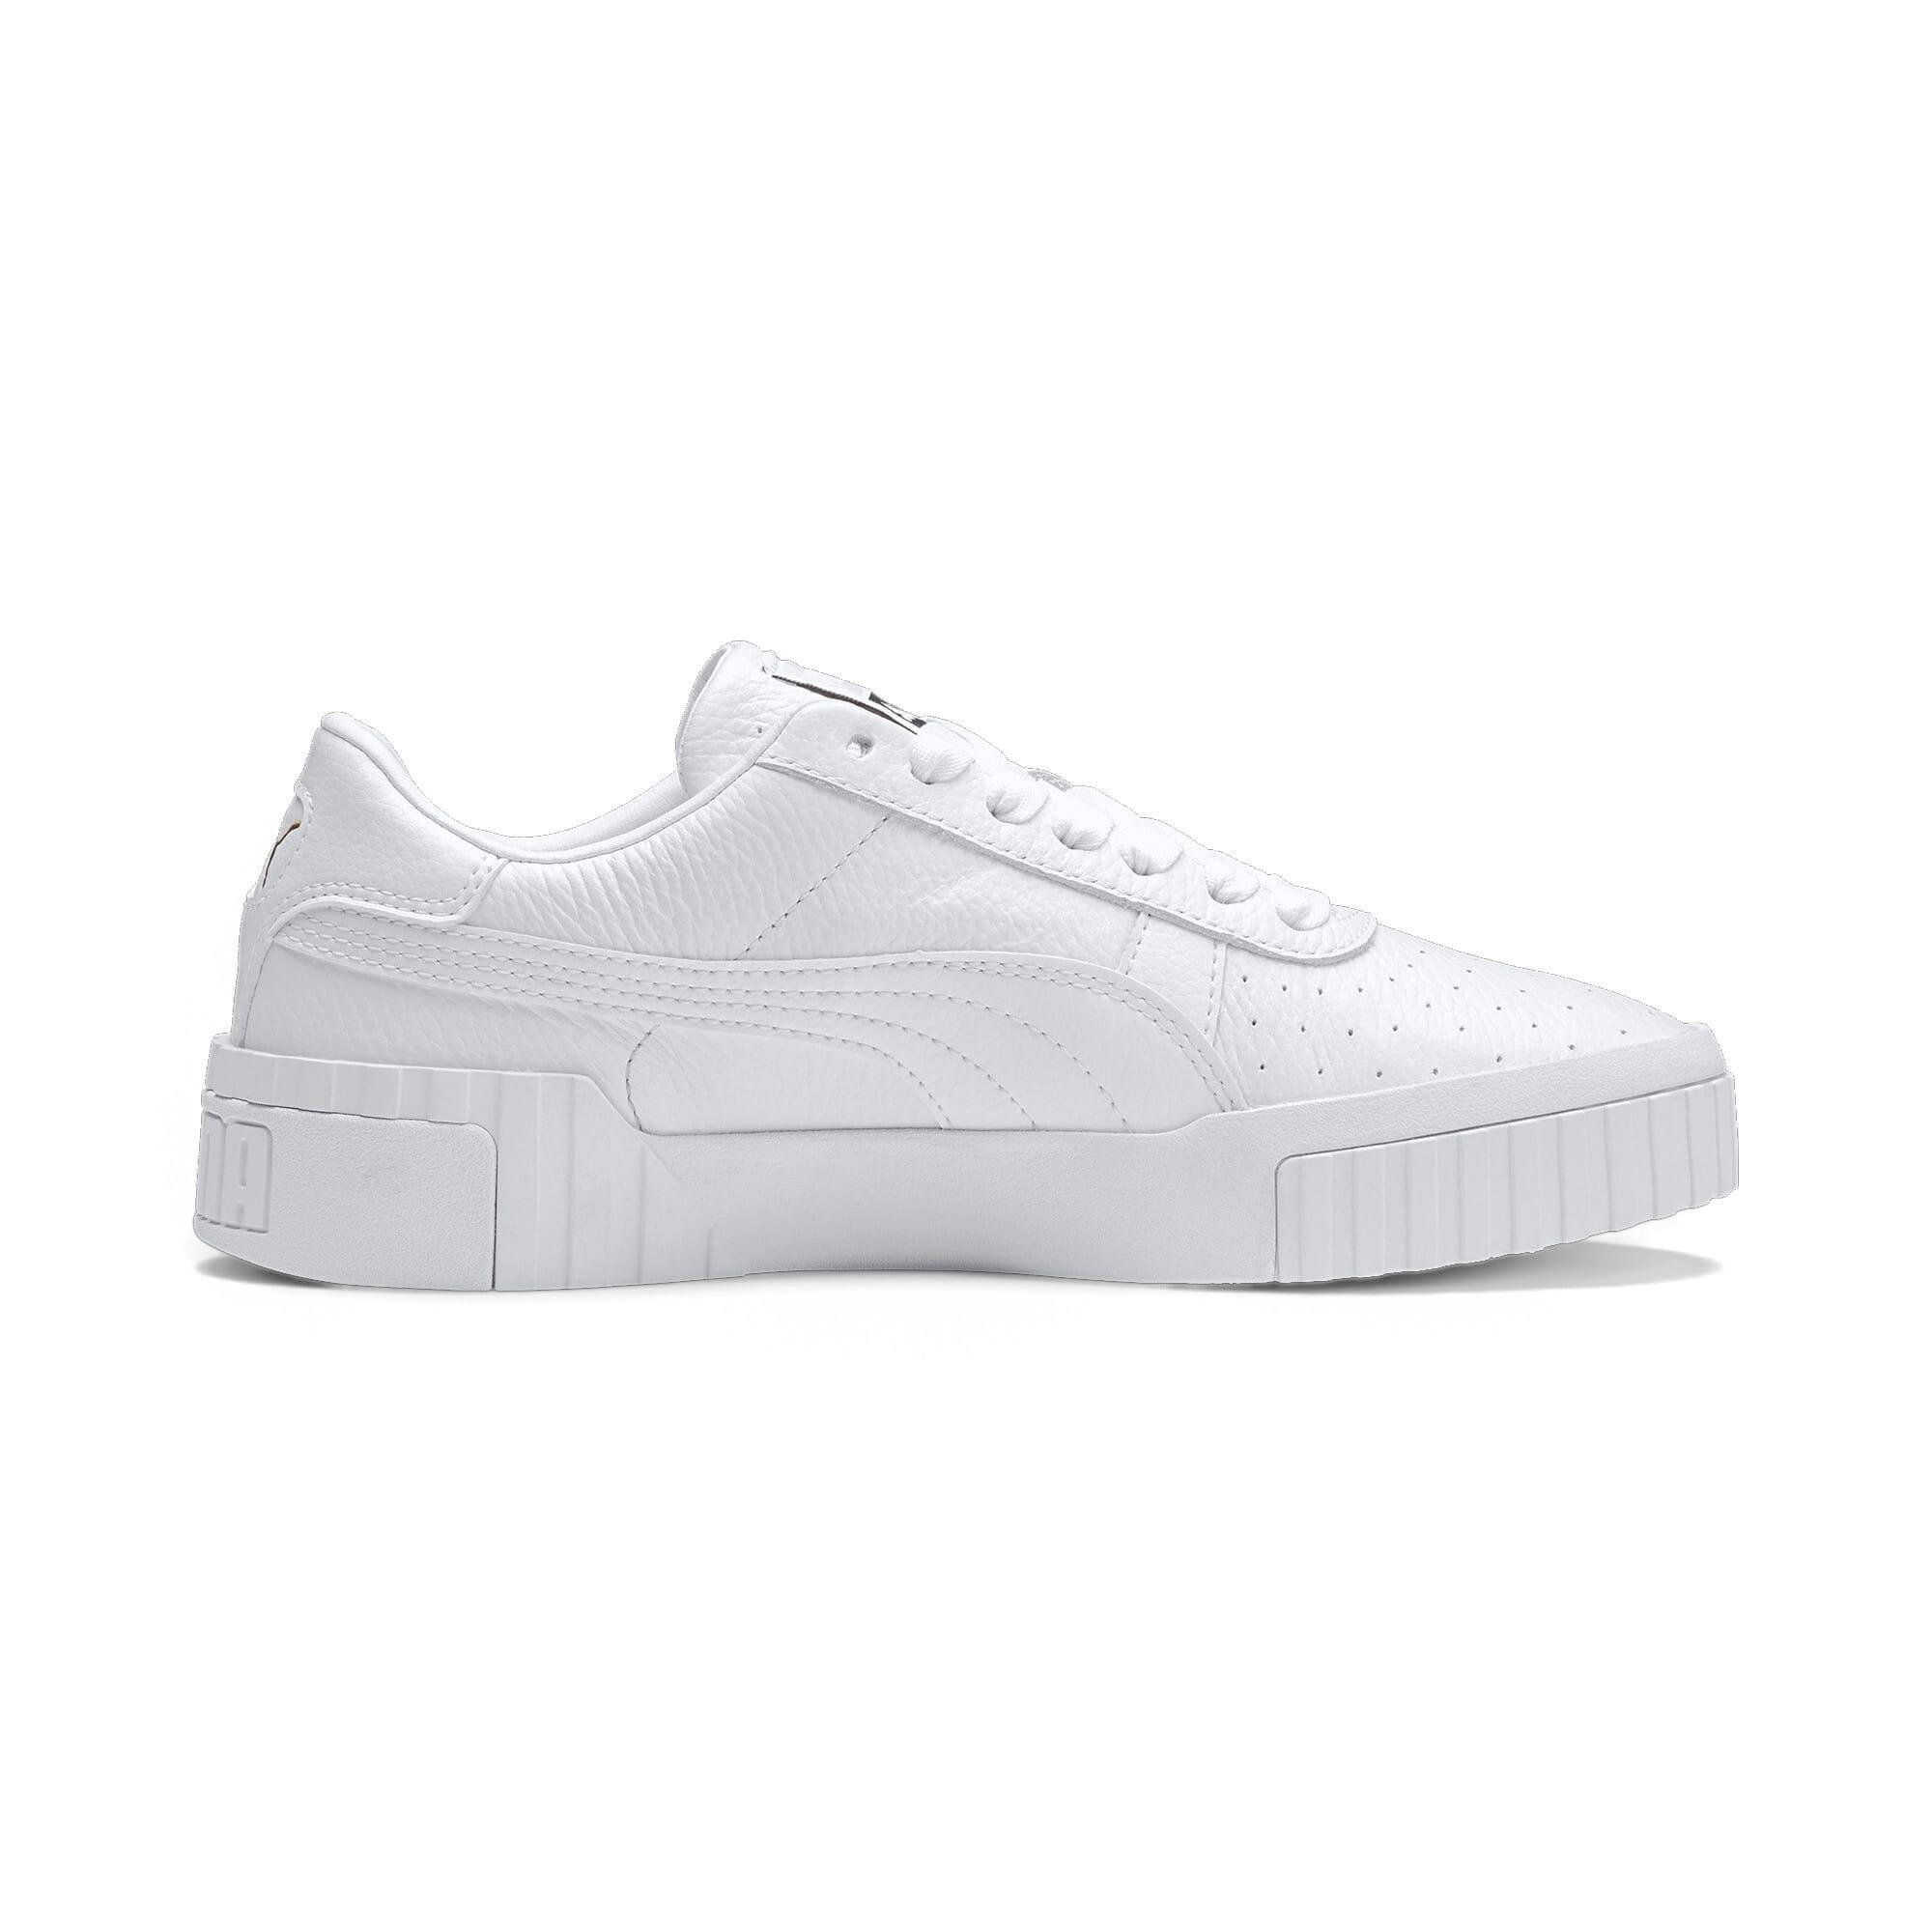 Thumbnail 6 of Cali Women's Sneakers, Puma White-Puma White, medium